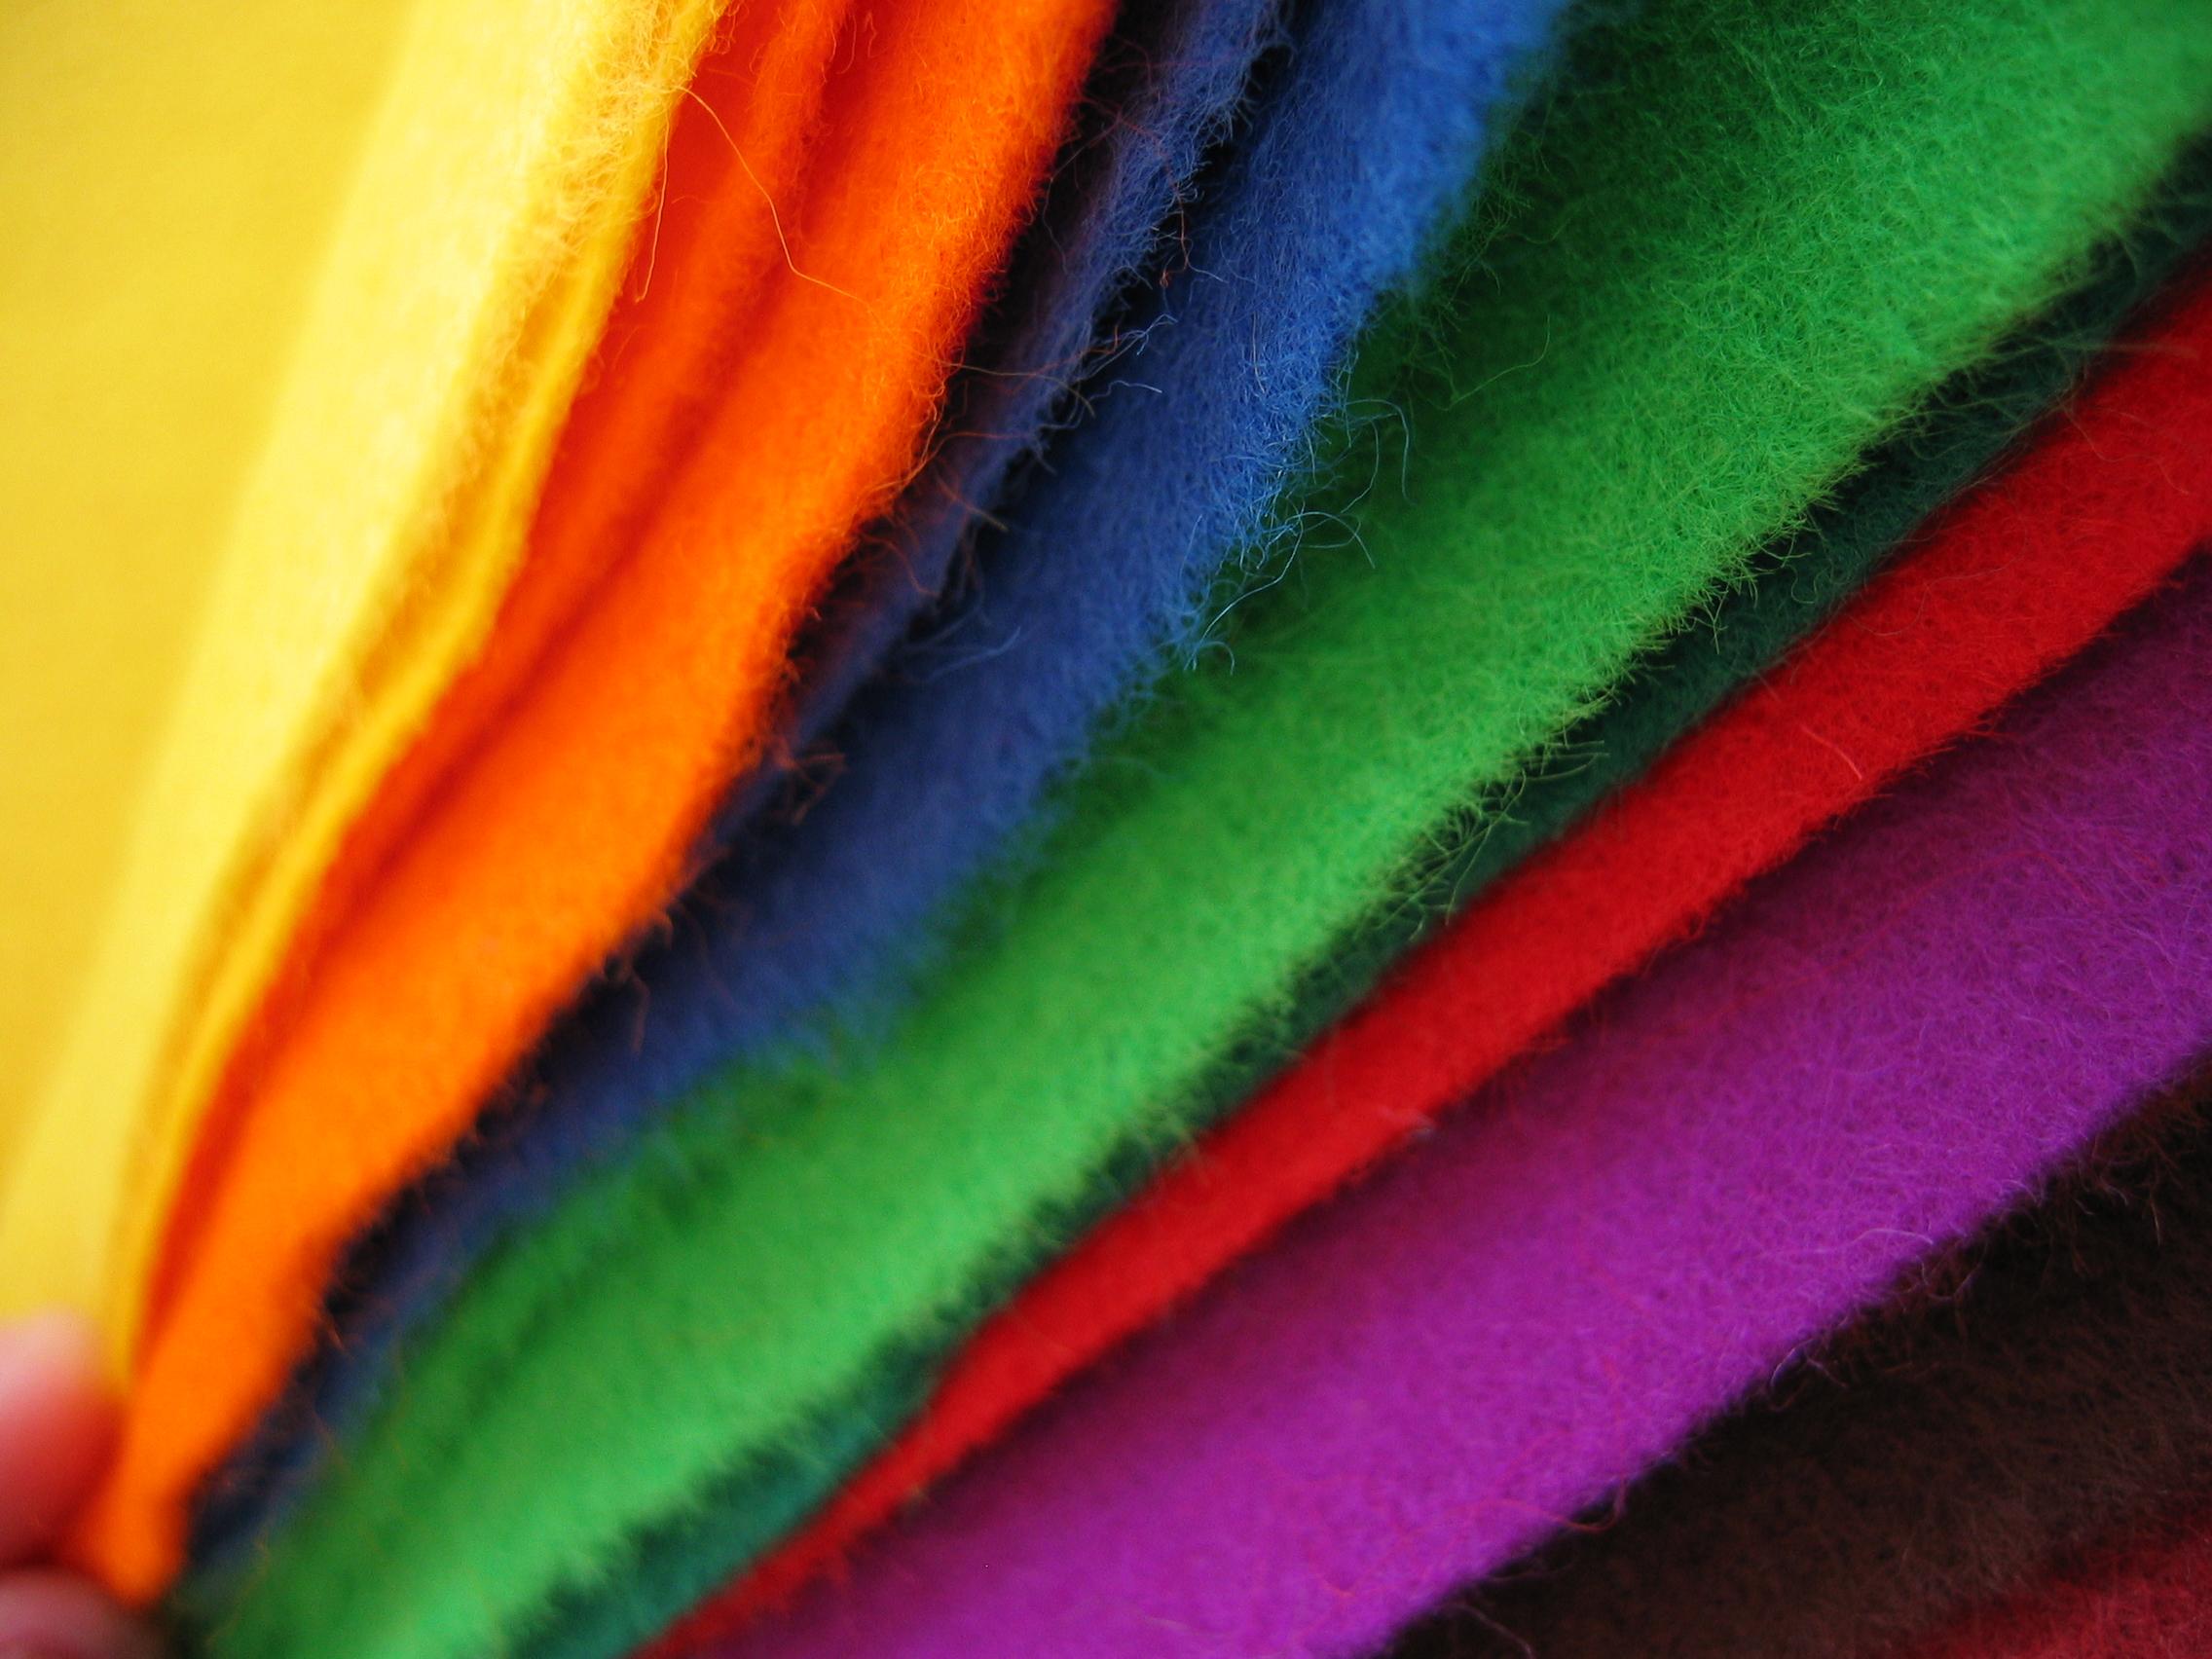 Colored felt cloth